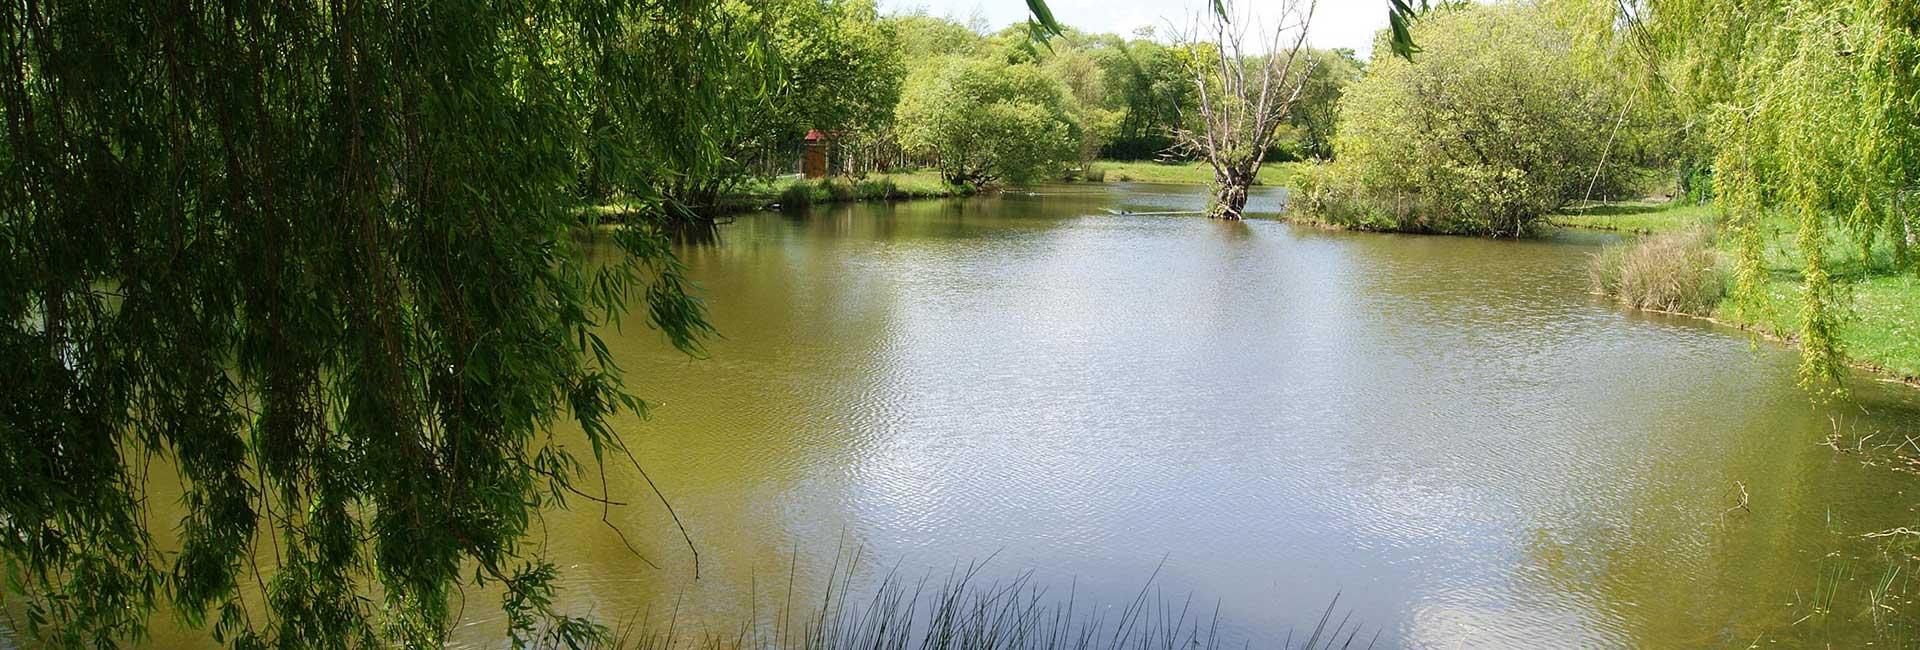 camping avec 2 étangs de pêche en Vendée